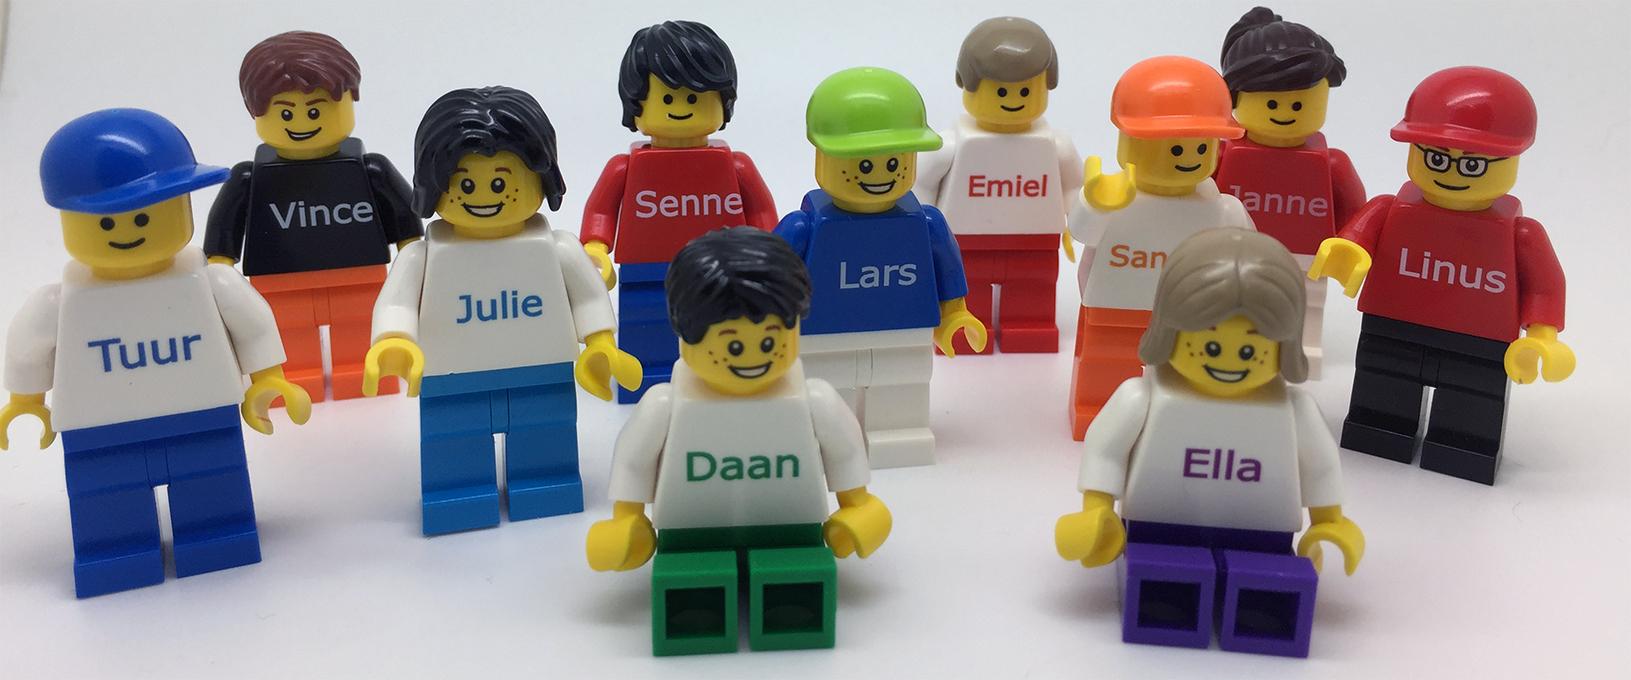 Lego Minifigs